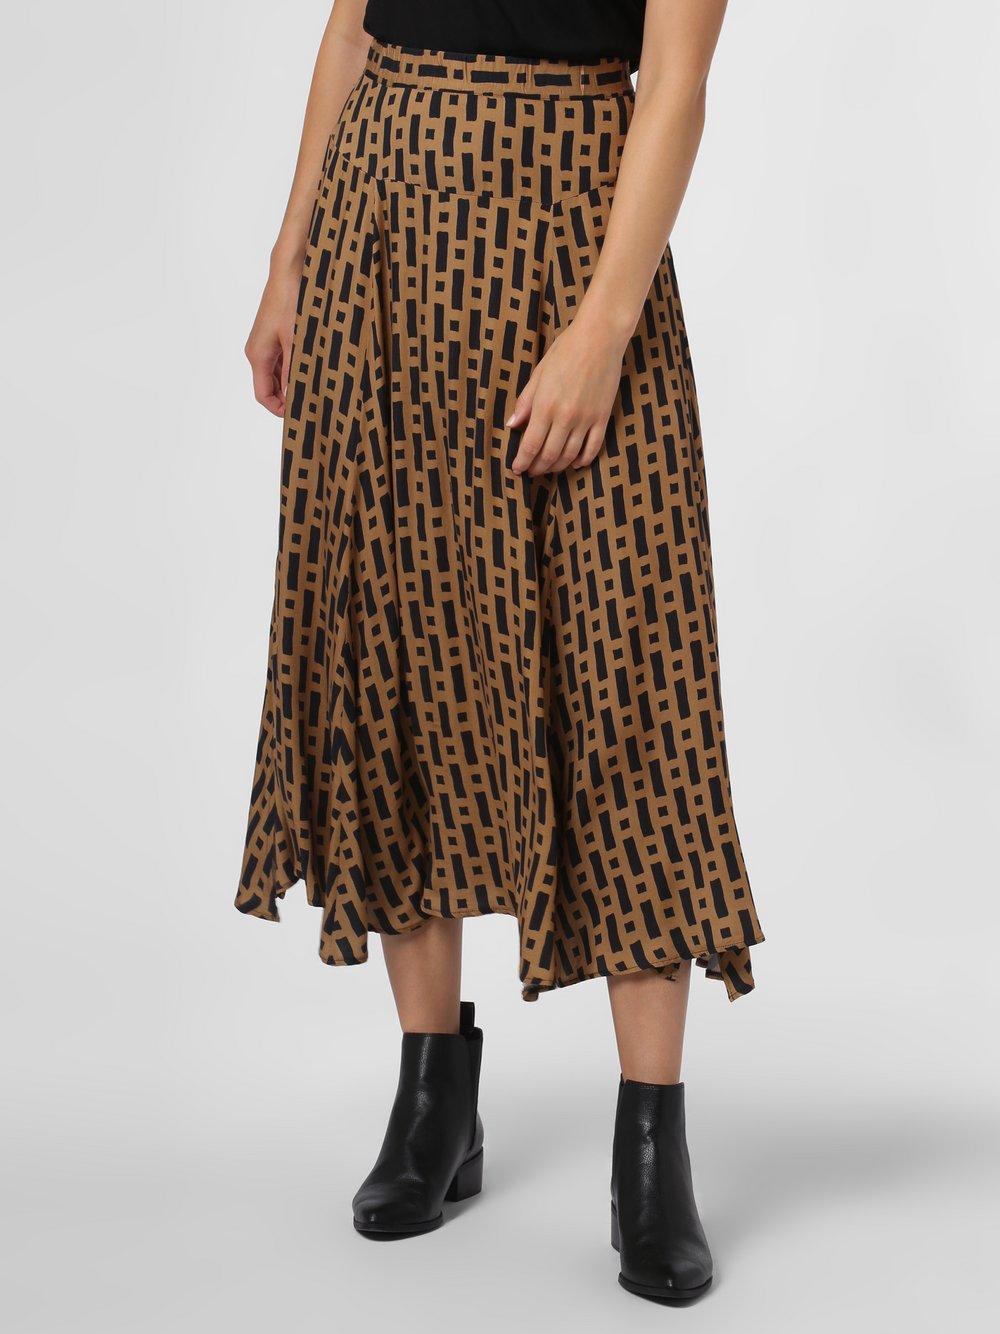 0039 Italy – Spódnica damska – Fili, beżowy Van Graaf 486057-0001-09920